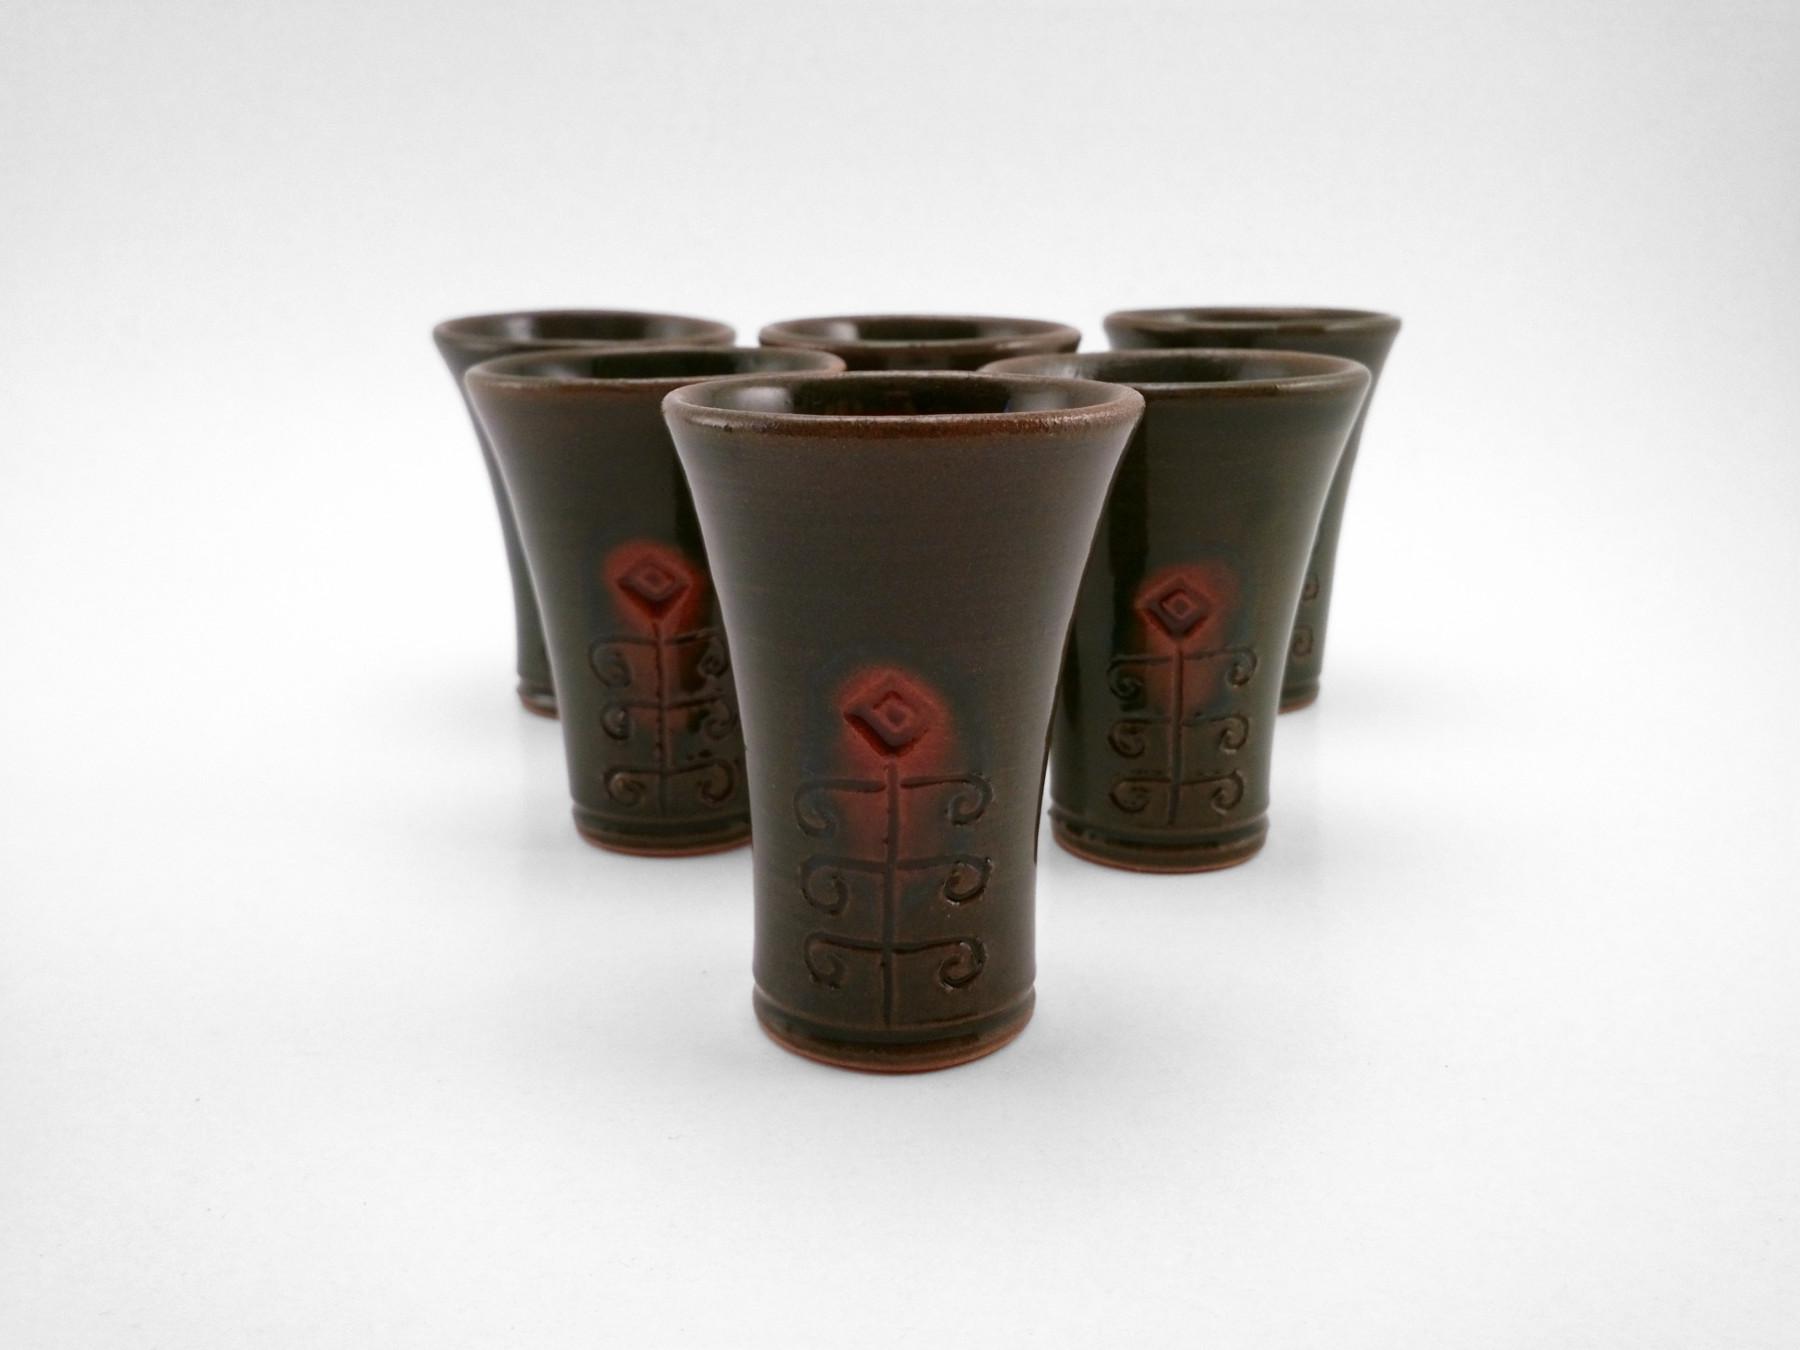 Pálinka Cups with Traditional Floral Pattern - Ildikó Károlyi